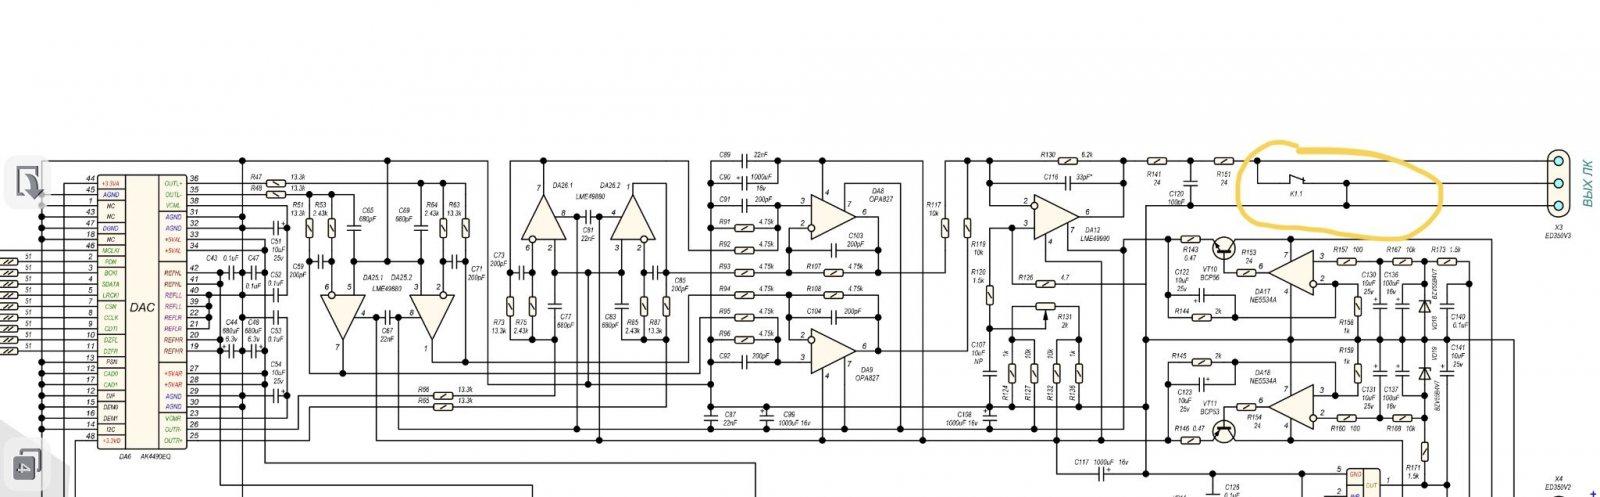 62668793-5A4E-4DC9-80FB-52B5E353F308.thumb.jpeg.8091a394d89d3e24c4624e382e5ad609.jpeg